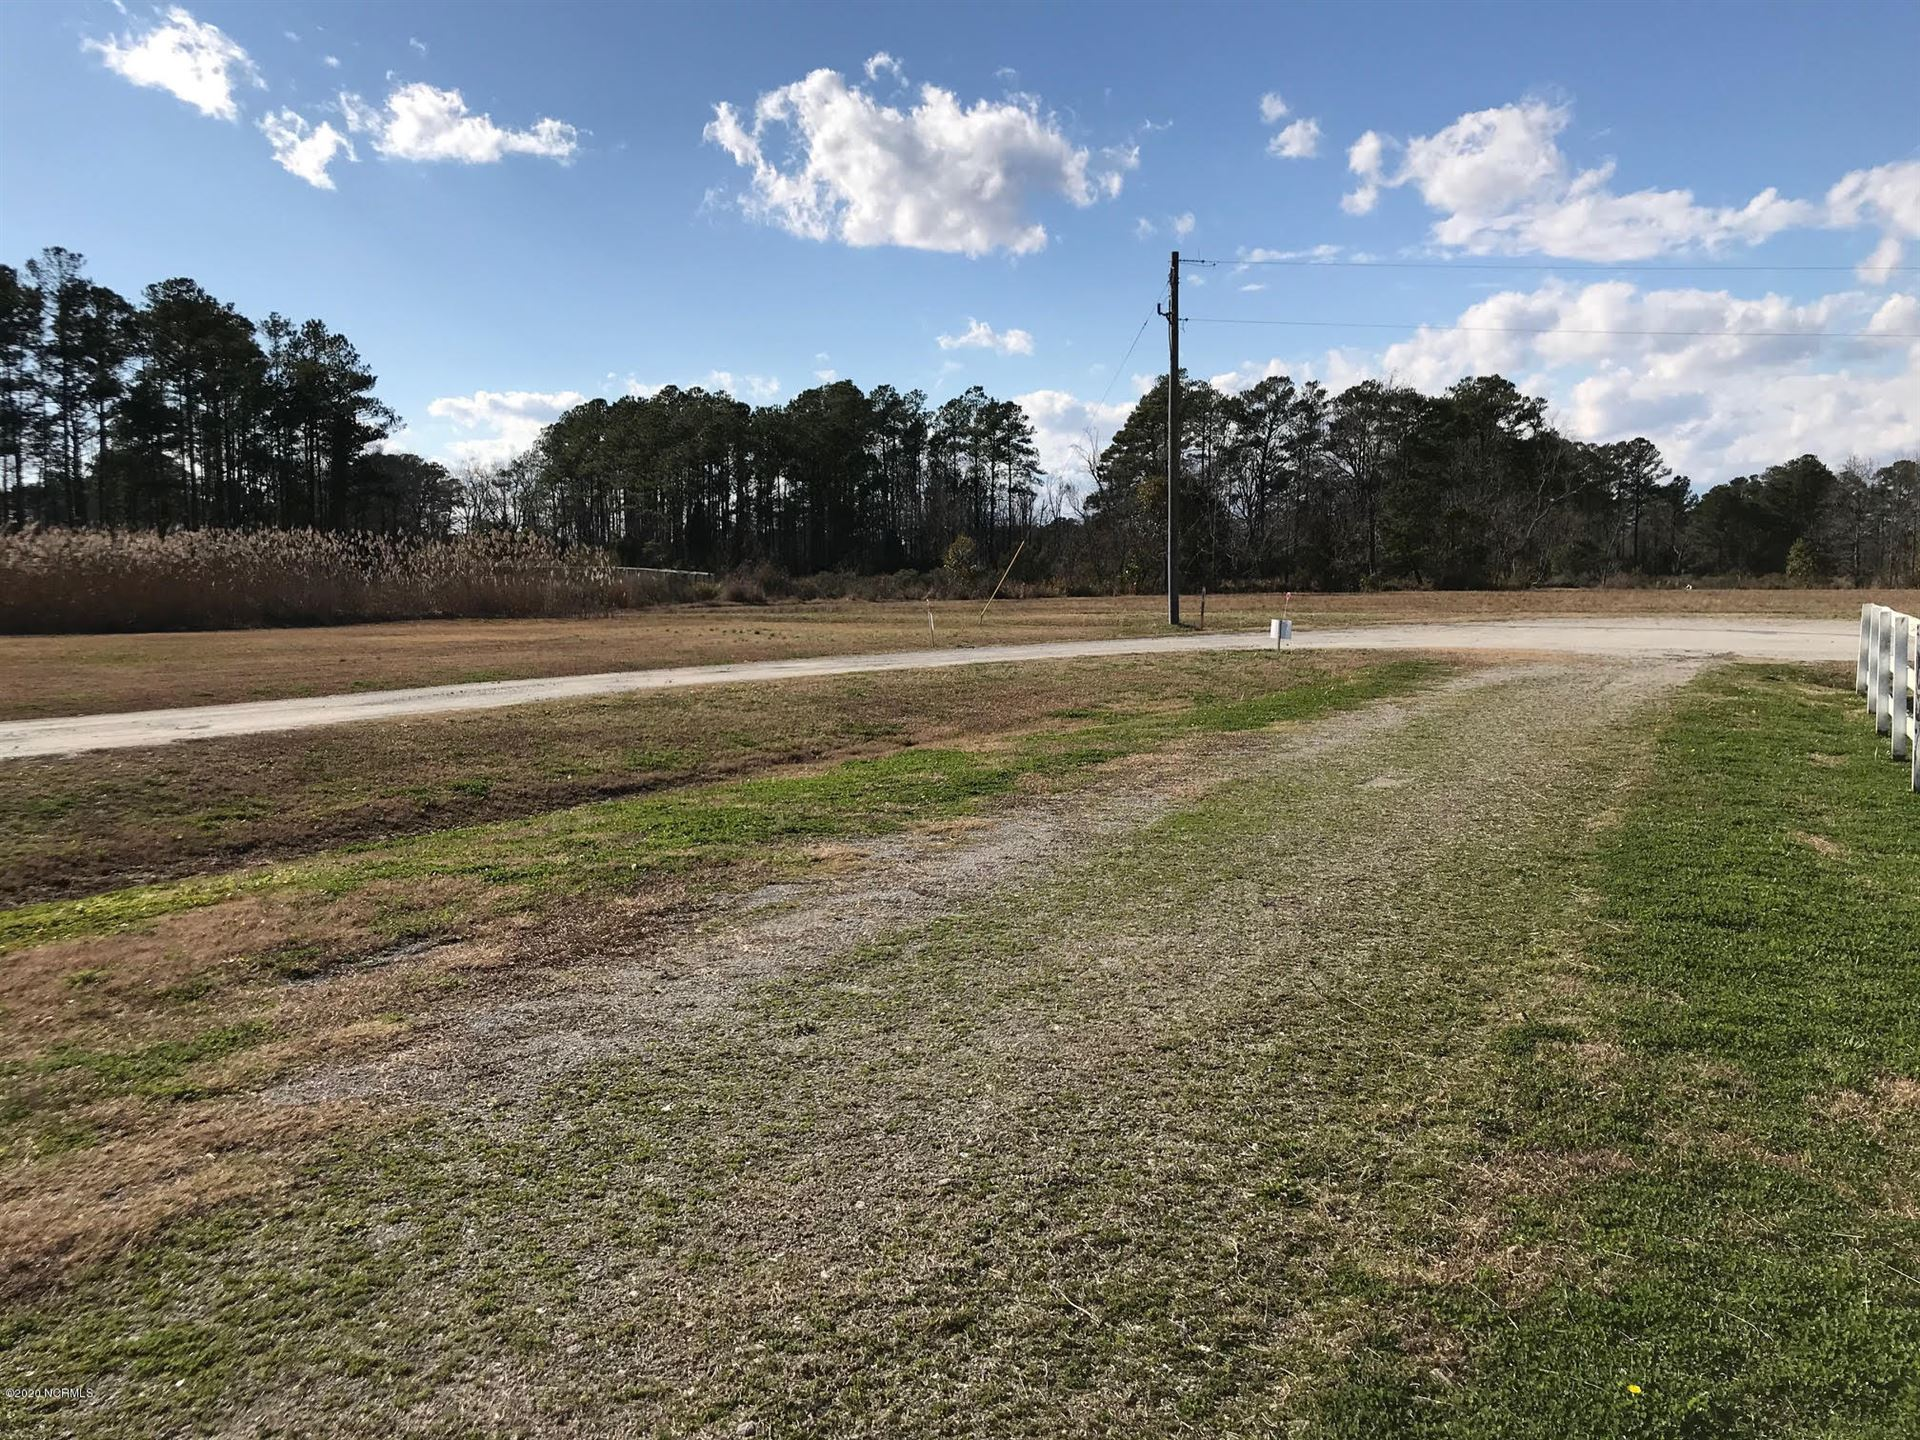 Photo of Lot 80 Dallas Paul Road, Belhaven, NC 27810 (MLS # 100199007)